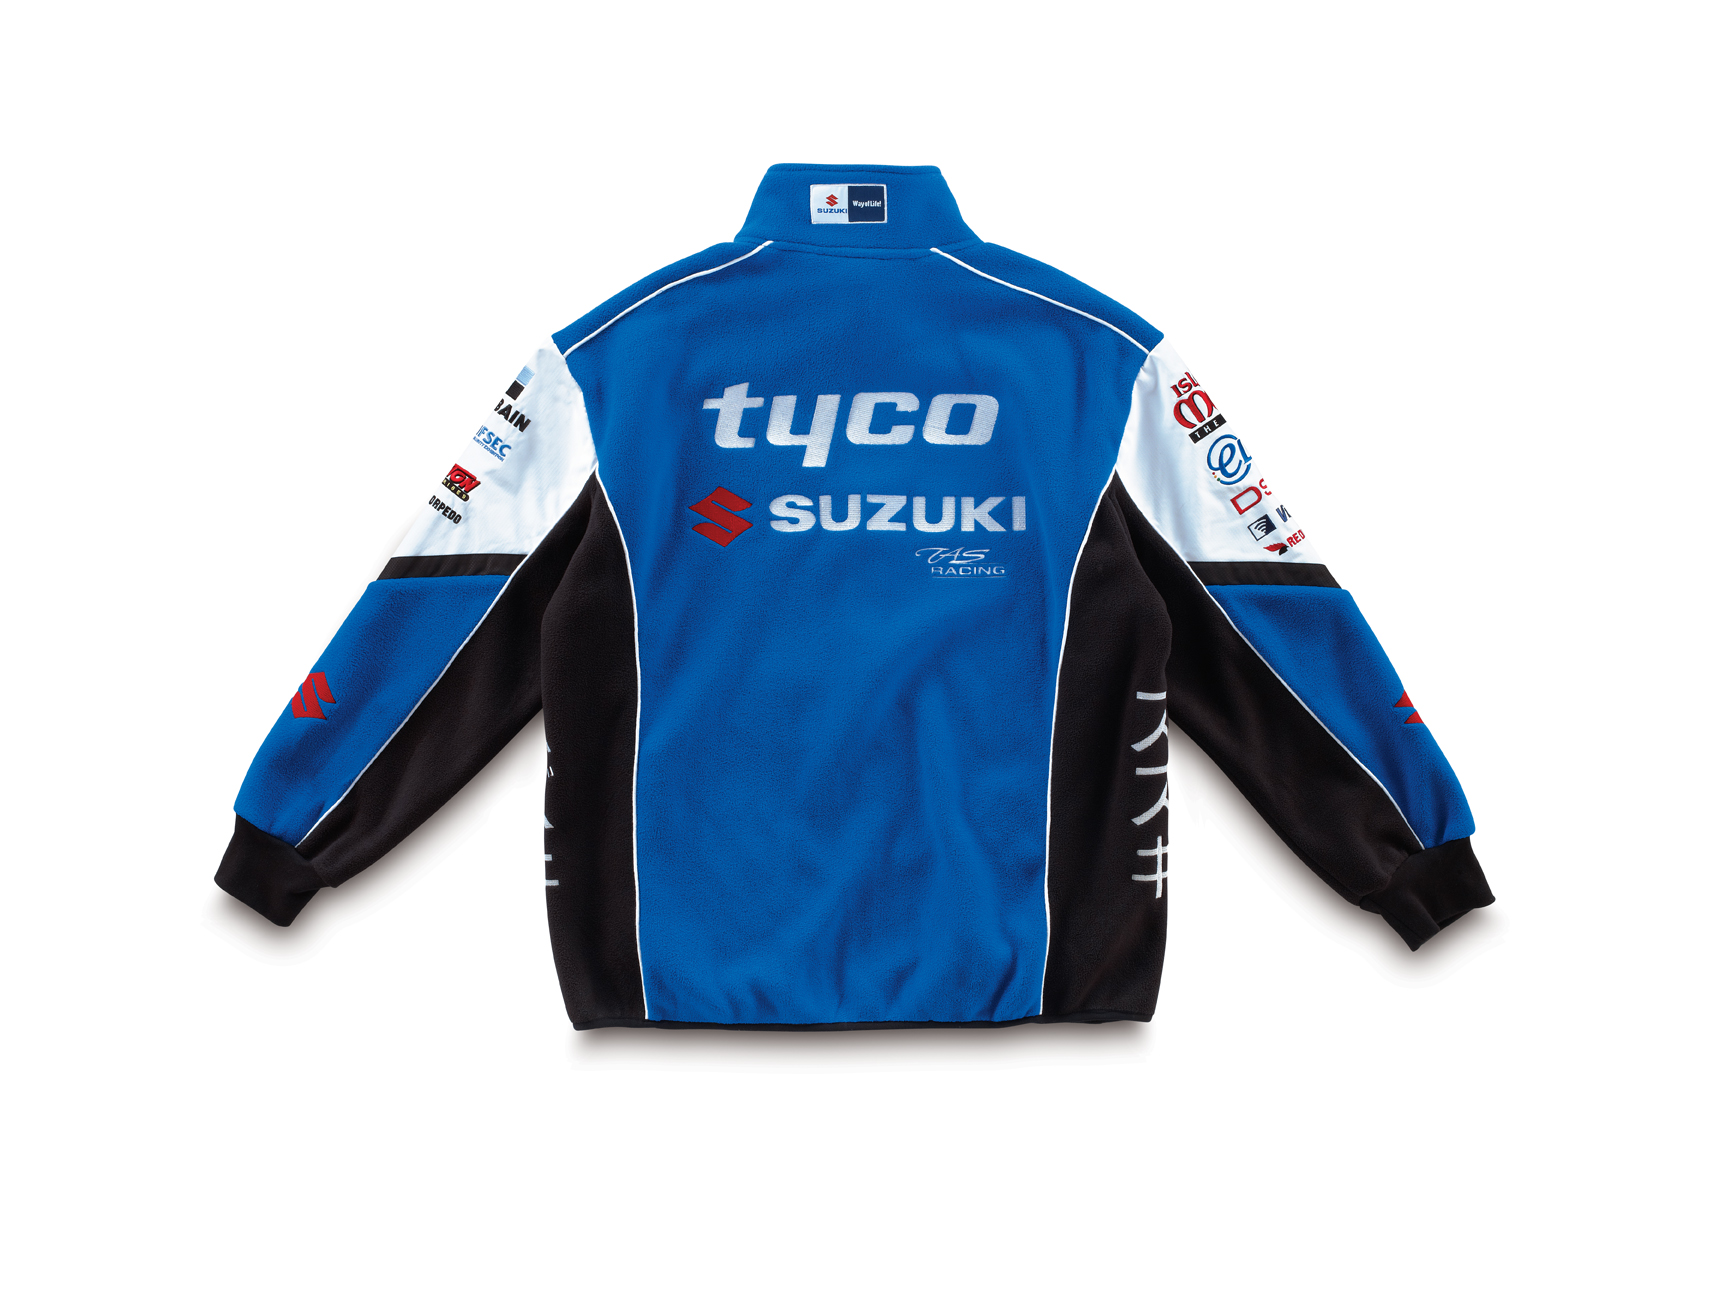 Suzuki Tyco Clothing